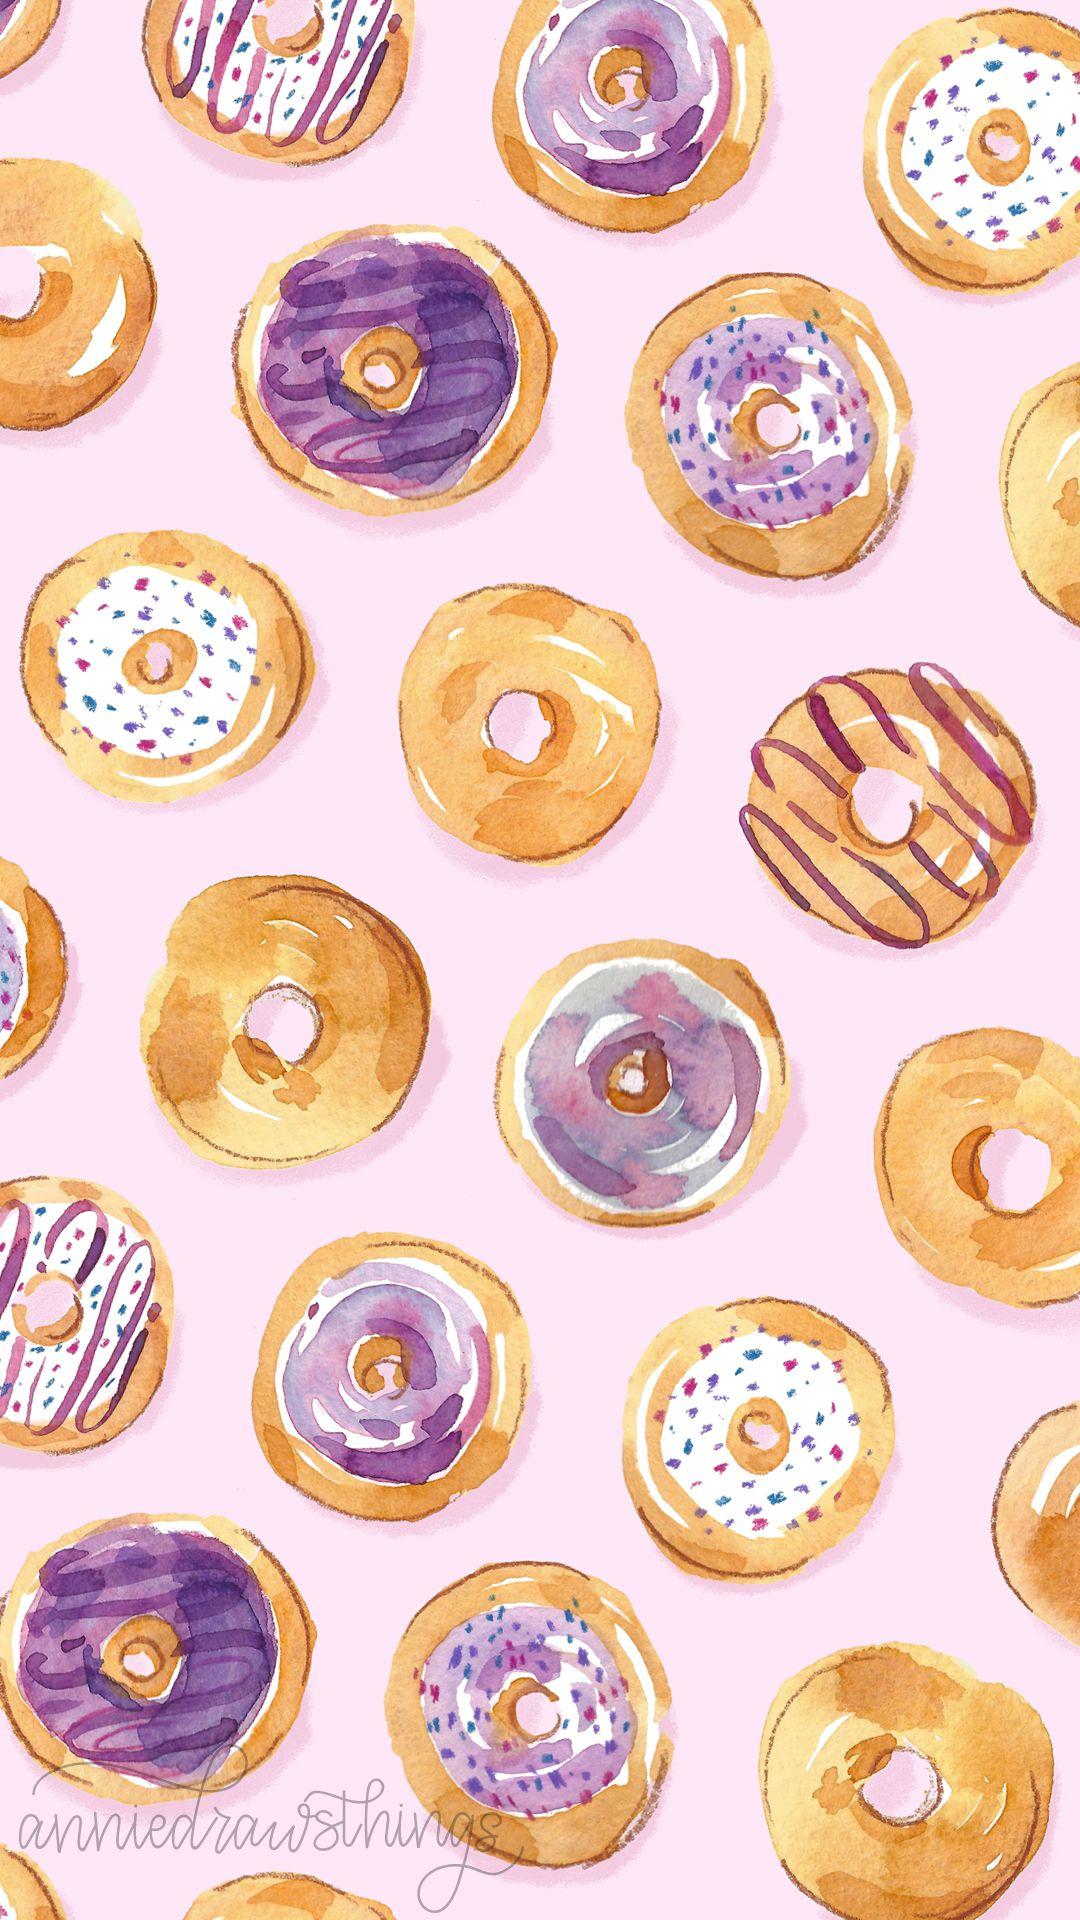 Cute Watercolor Donut Wallpaper Annie Parsons Food Artwork Watercolor Wallpaper Wallpaper